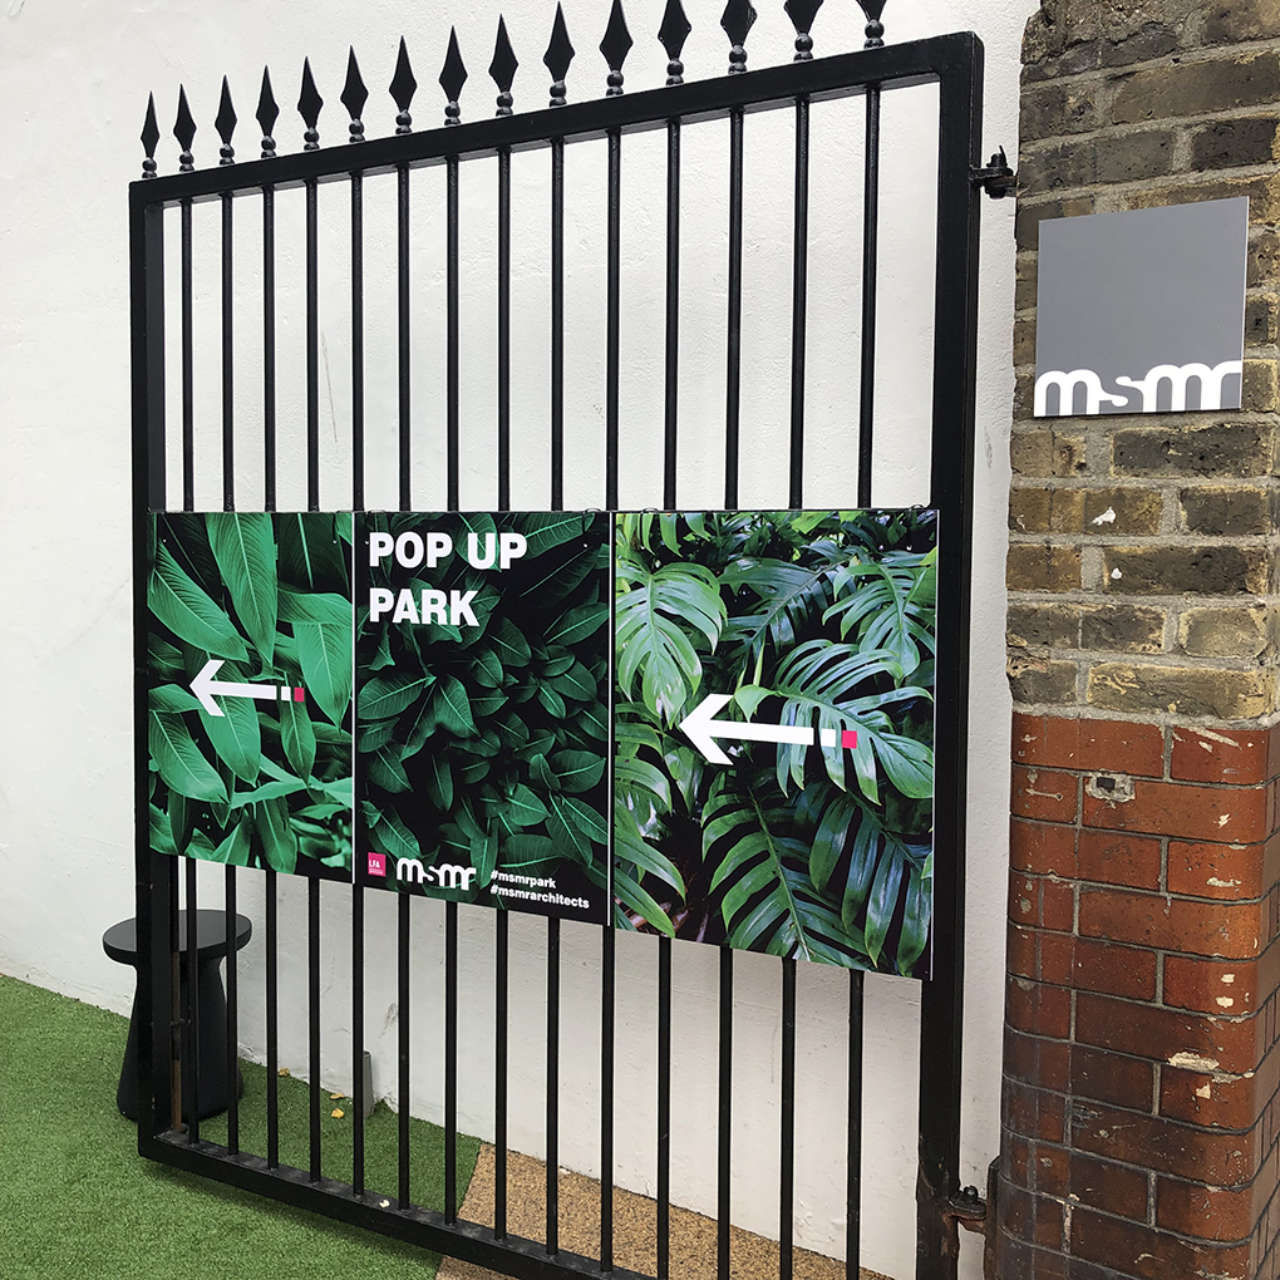 Pop-up Park Becomes Permanent